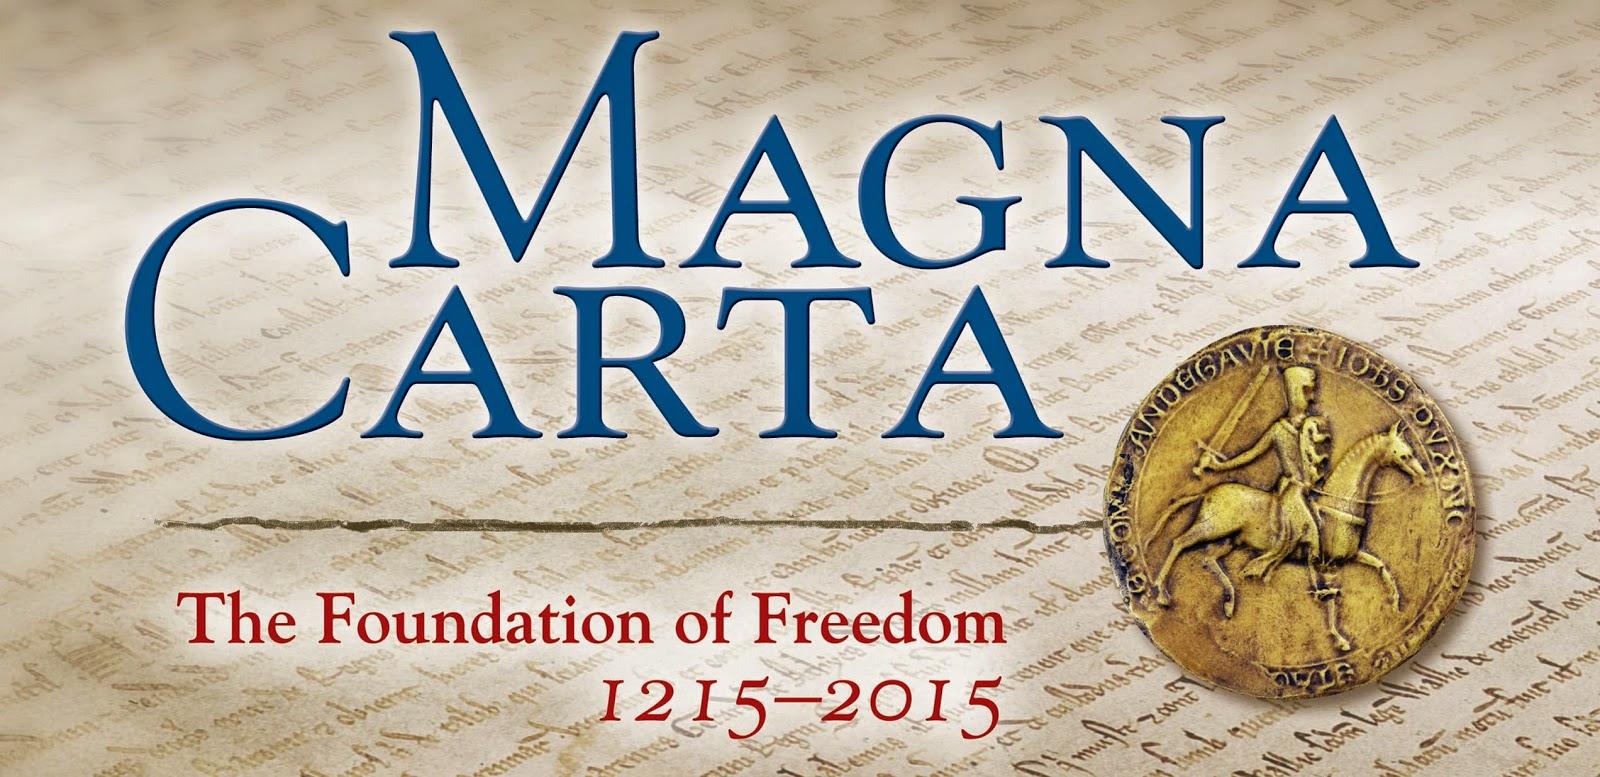 800 Tahun Magna Carta - The Foundation of Freedom